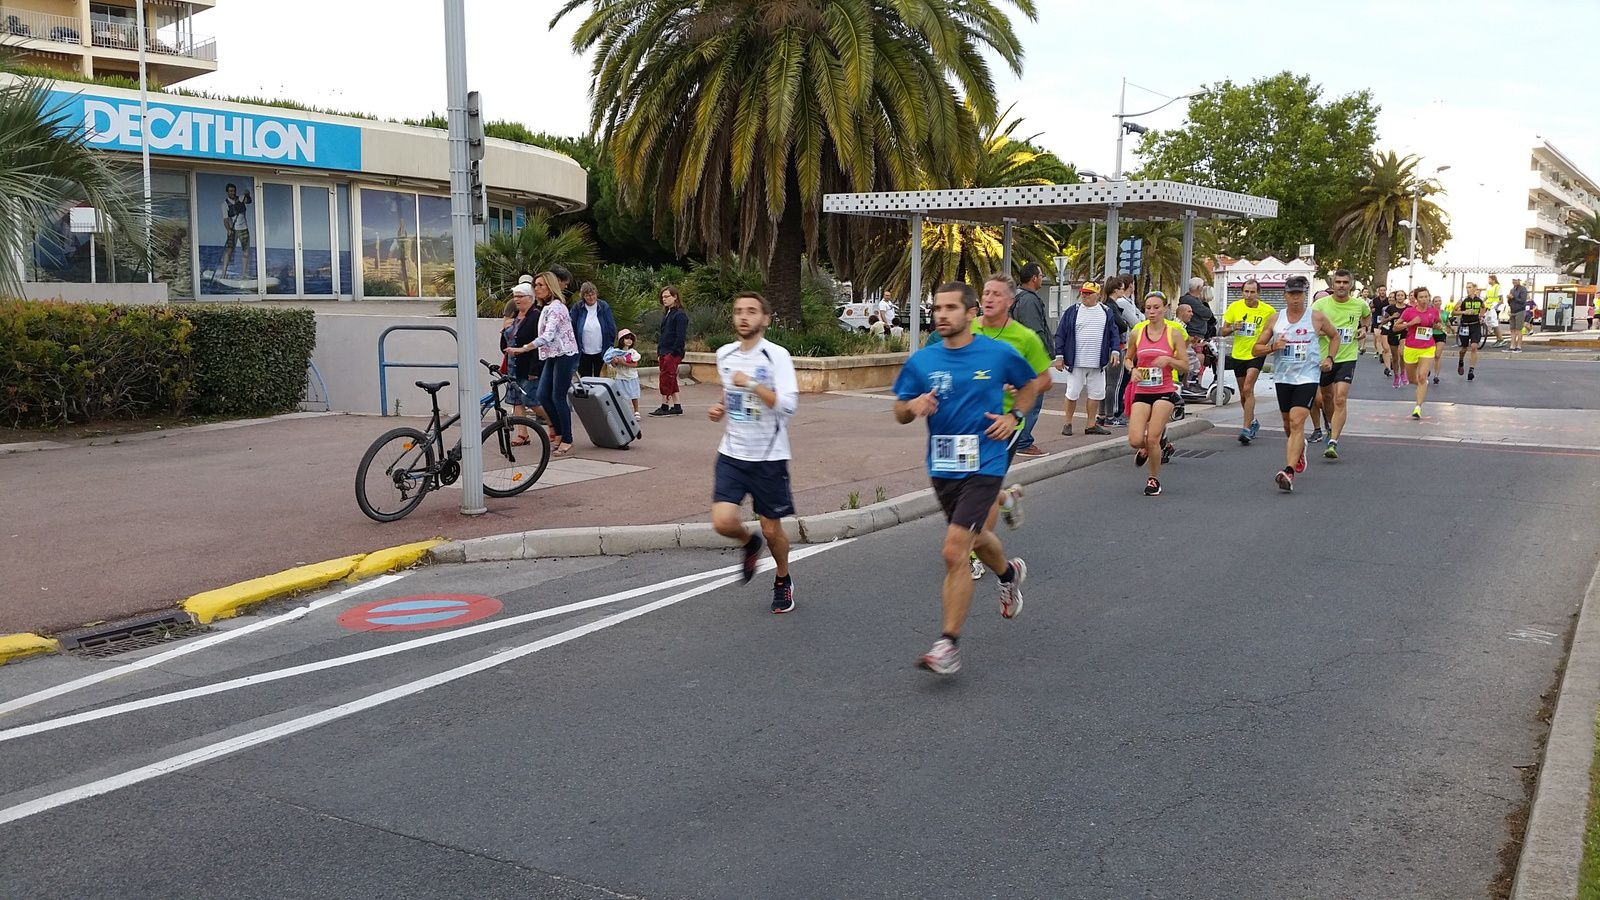 18-06-2016 FREJUS - 10 km